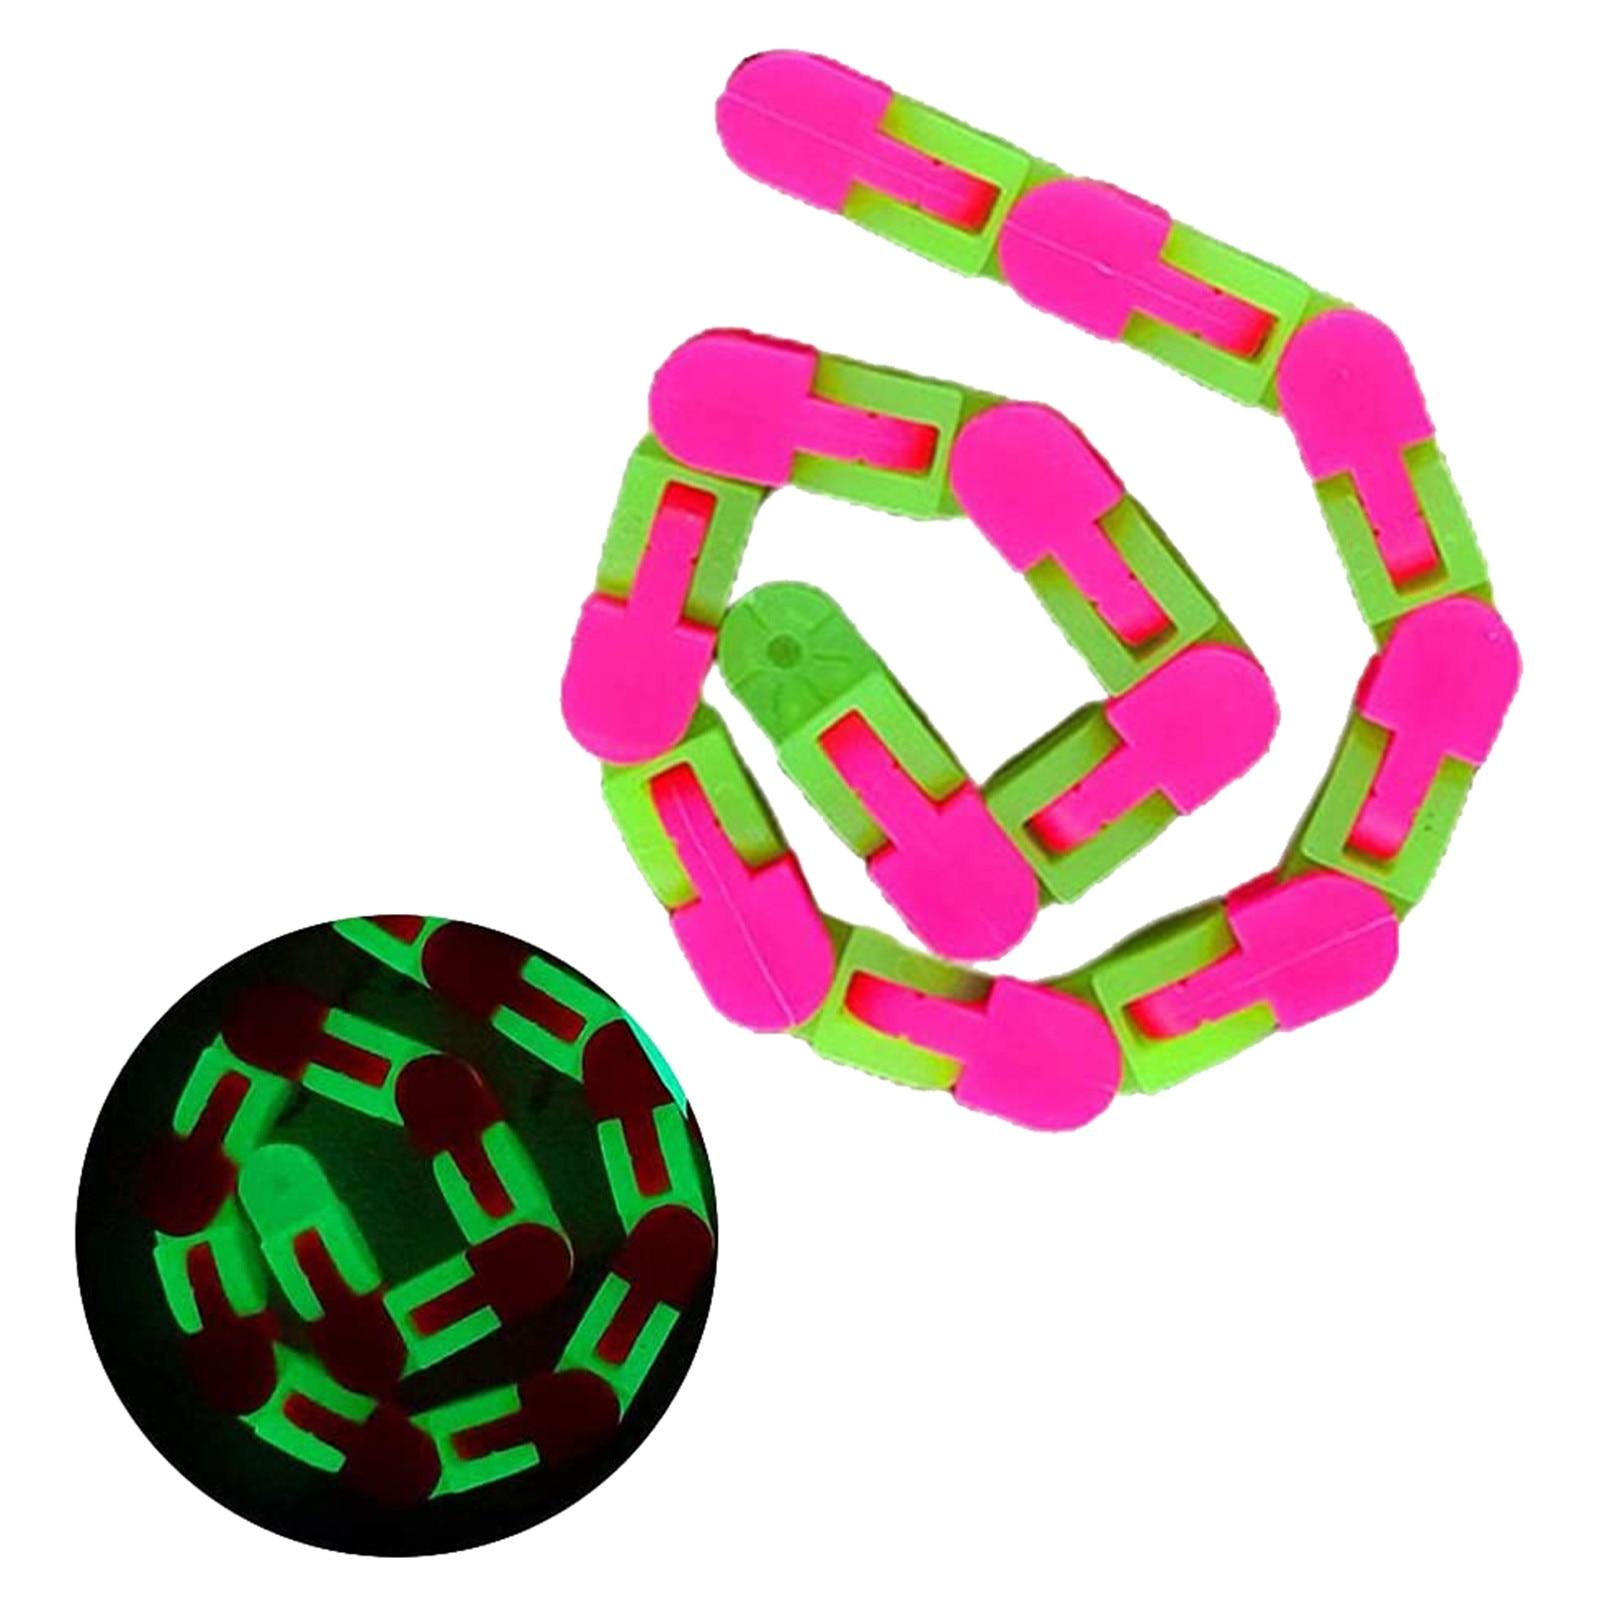 24 Knots Glow Pink Green Wacky Tracks Fidget Toys for Stress Relief